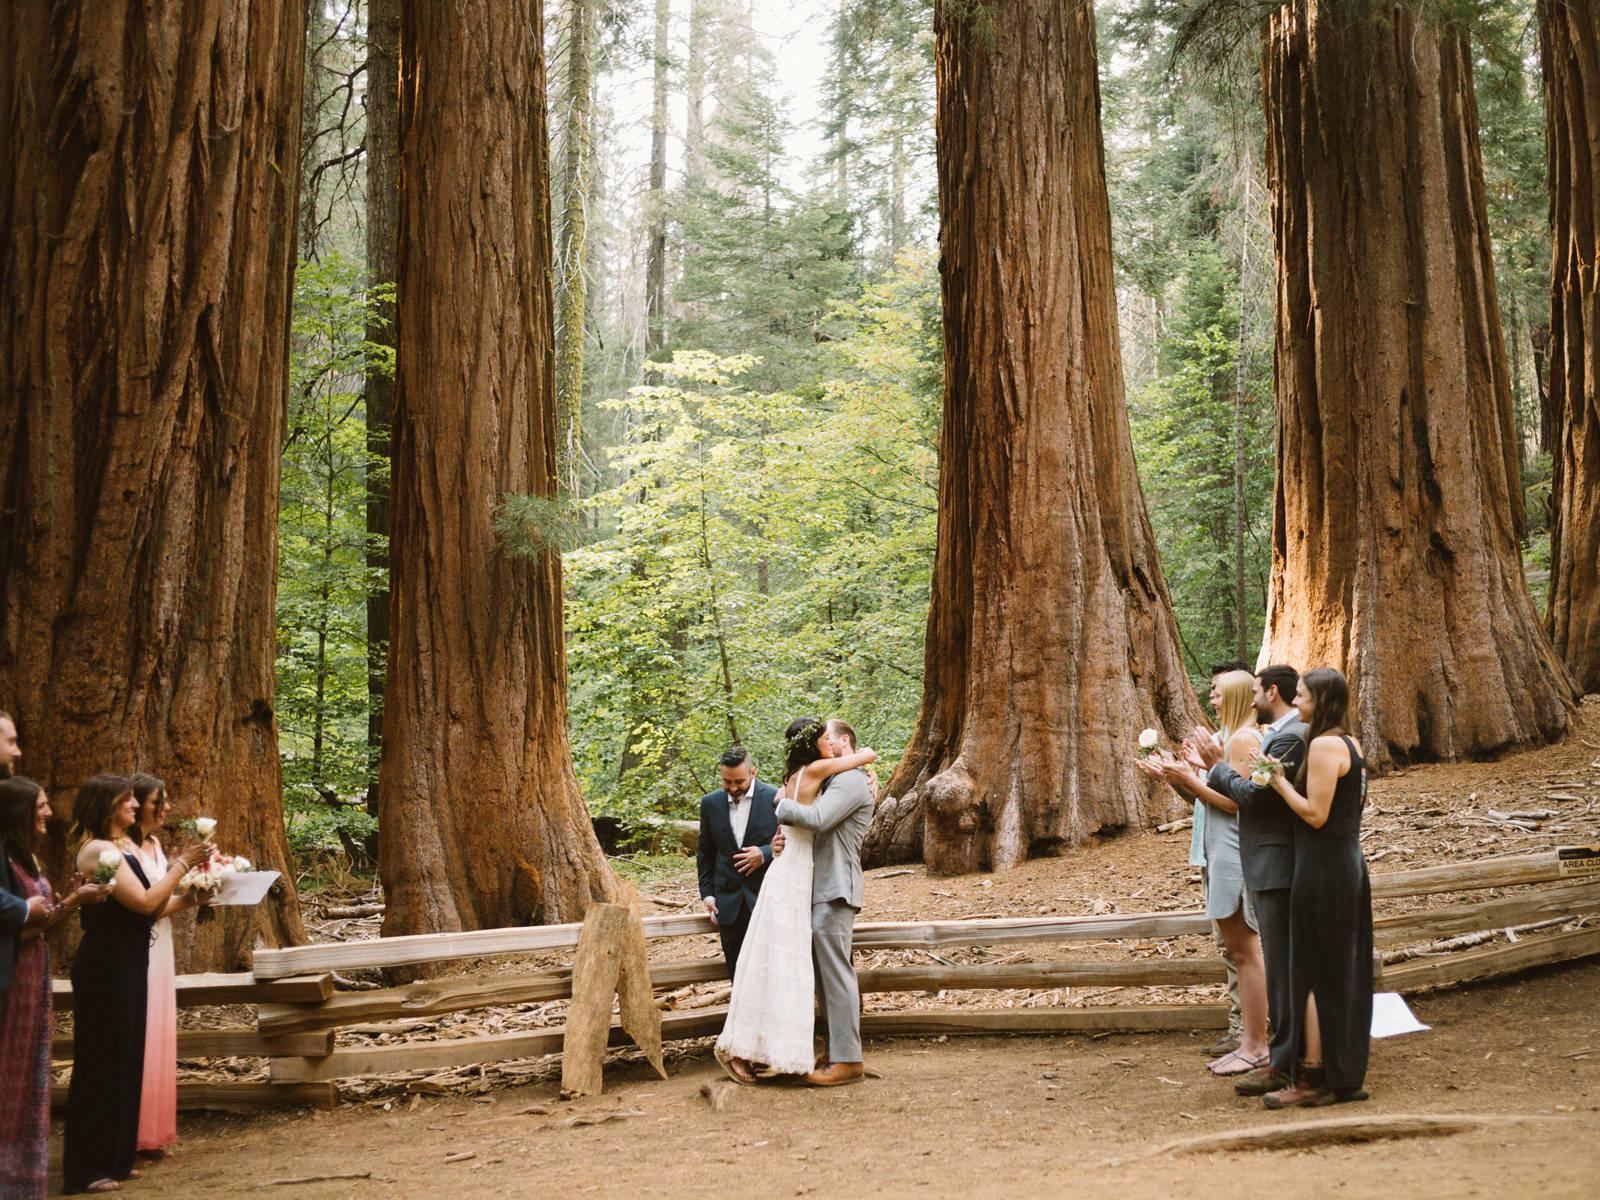 yosemite-intimate-wedding-063 YOSEMITE INTIMATE WEDDING